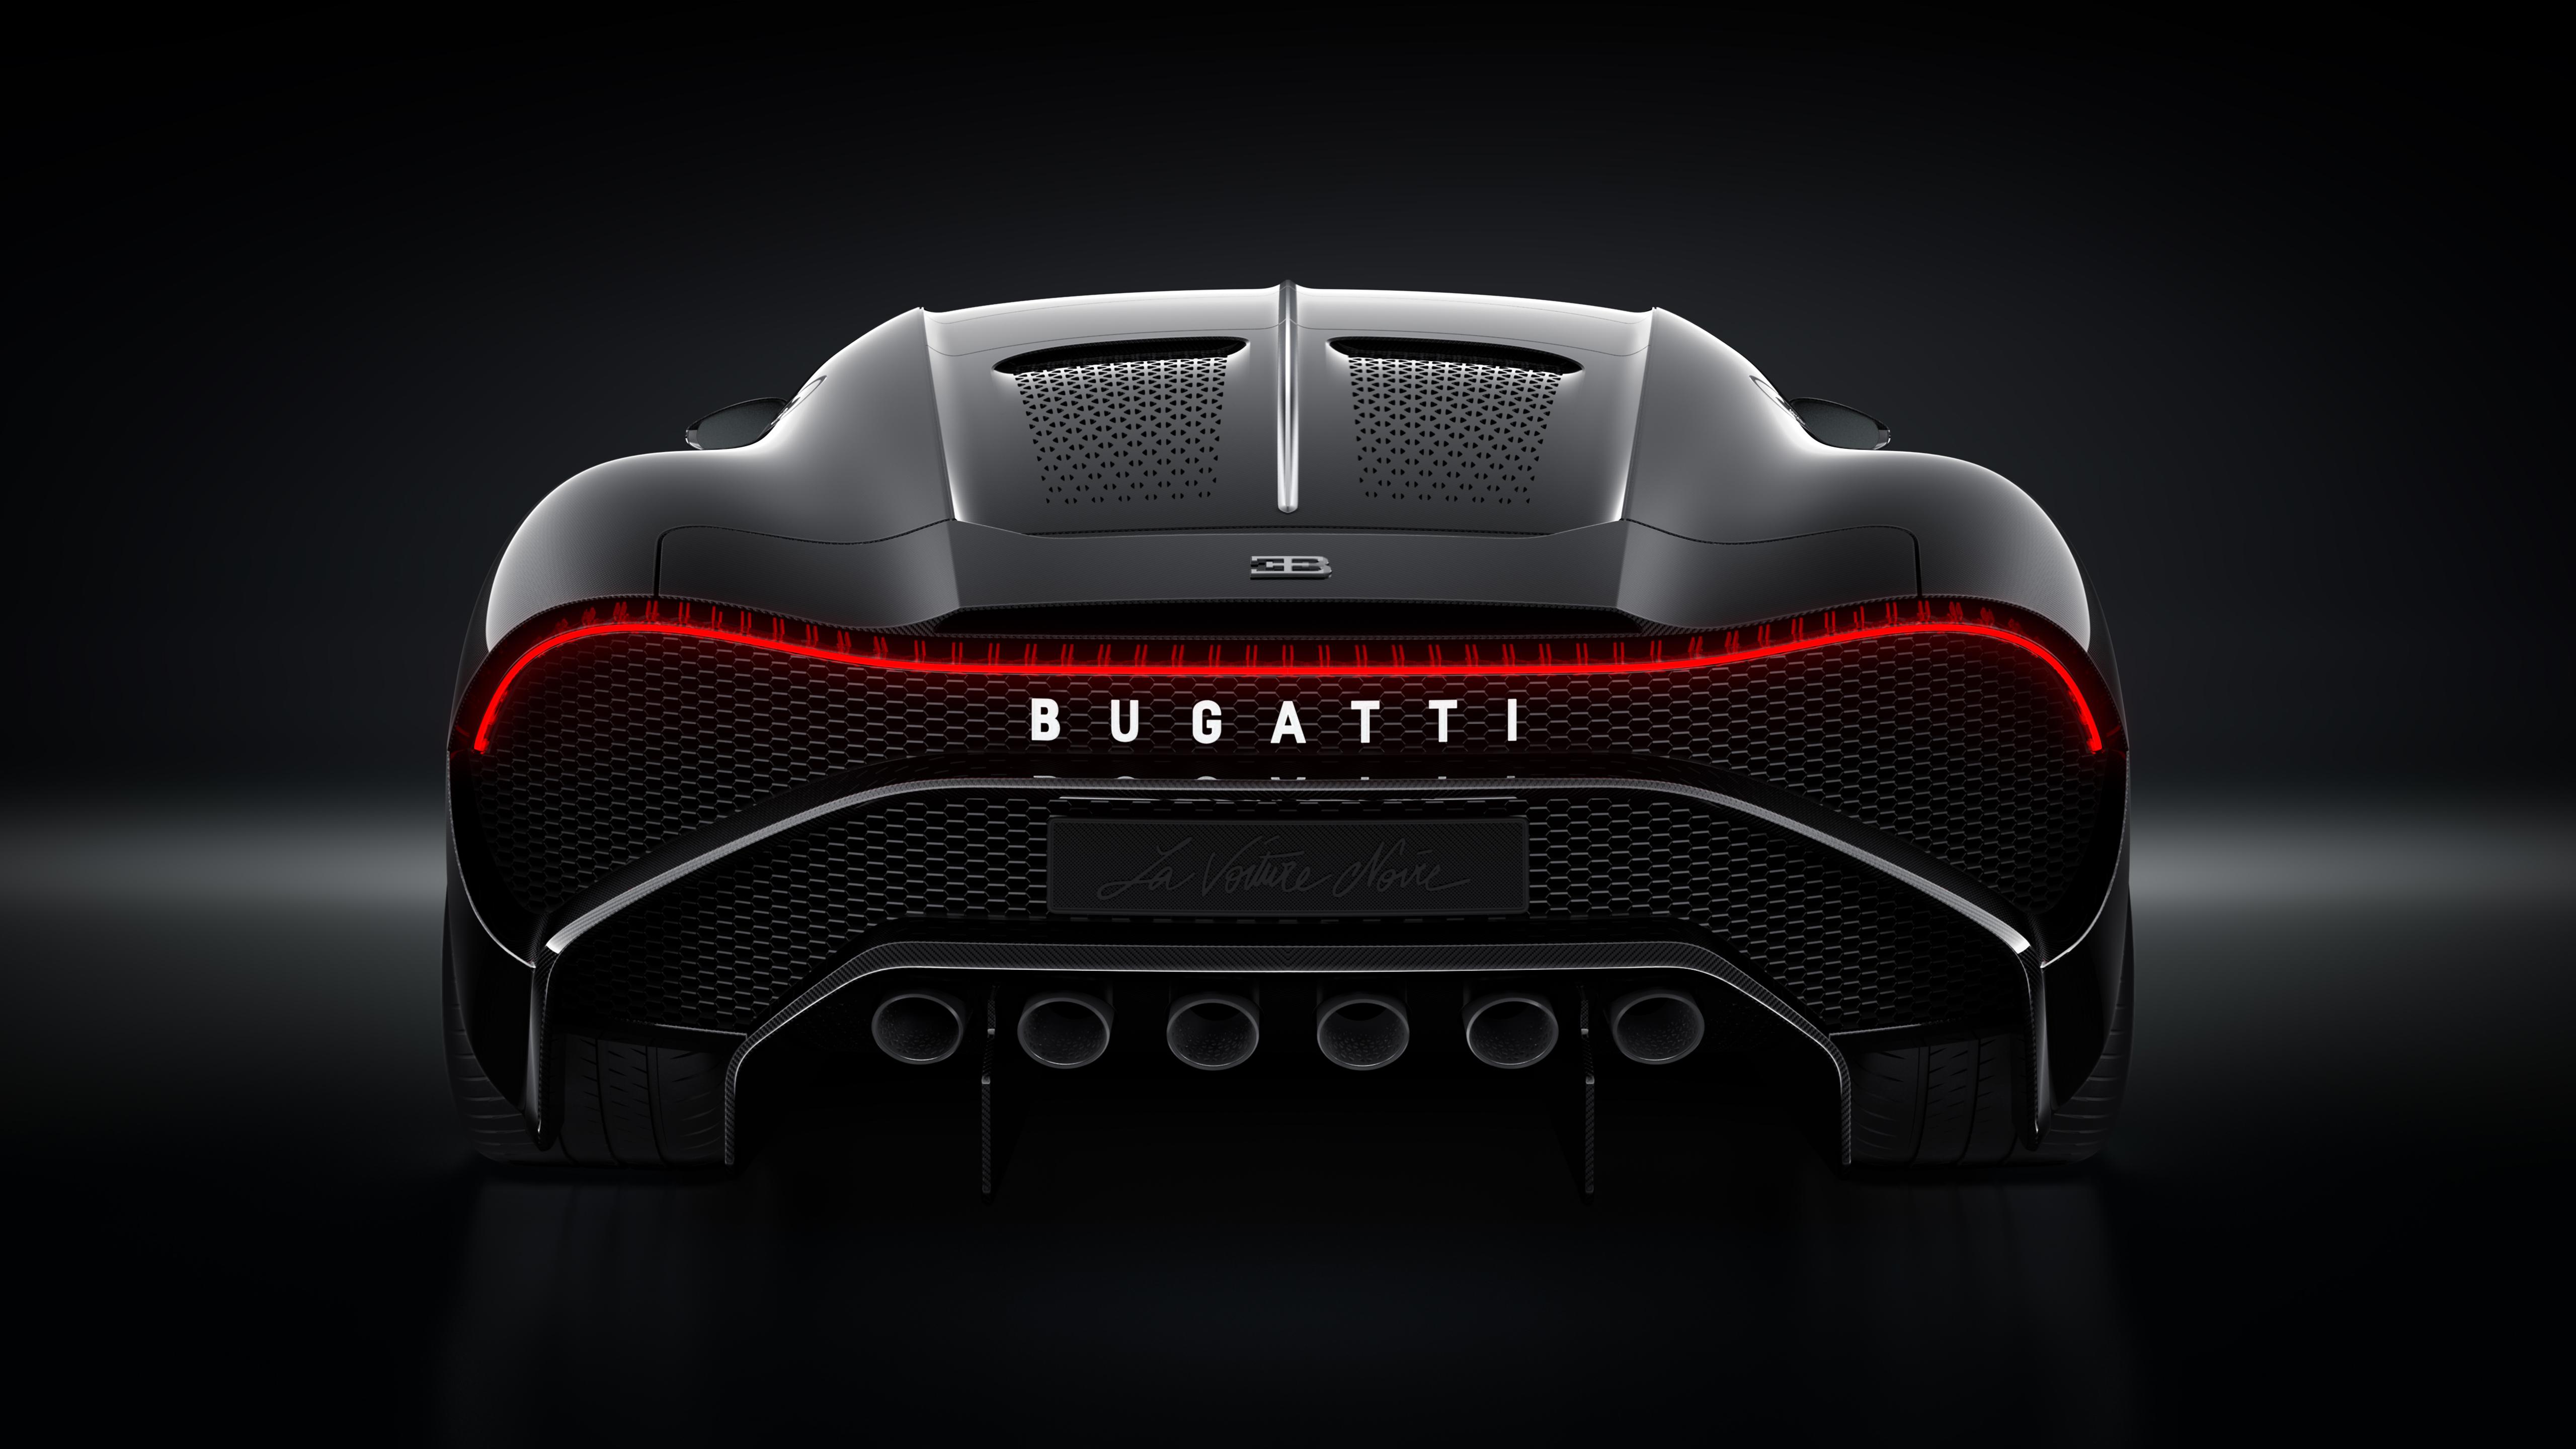 Bugatti La Voiture Noire 2019 4k 6 Wallpaper Hd Car